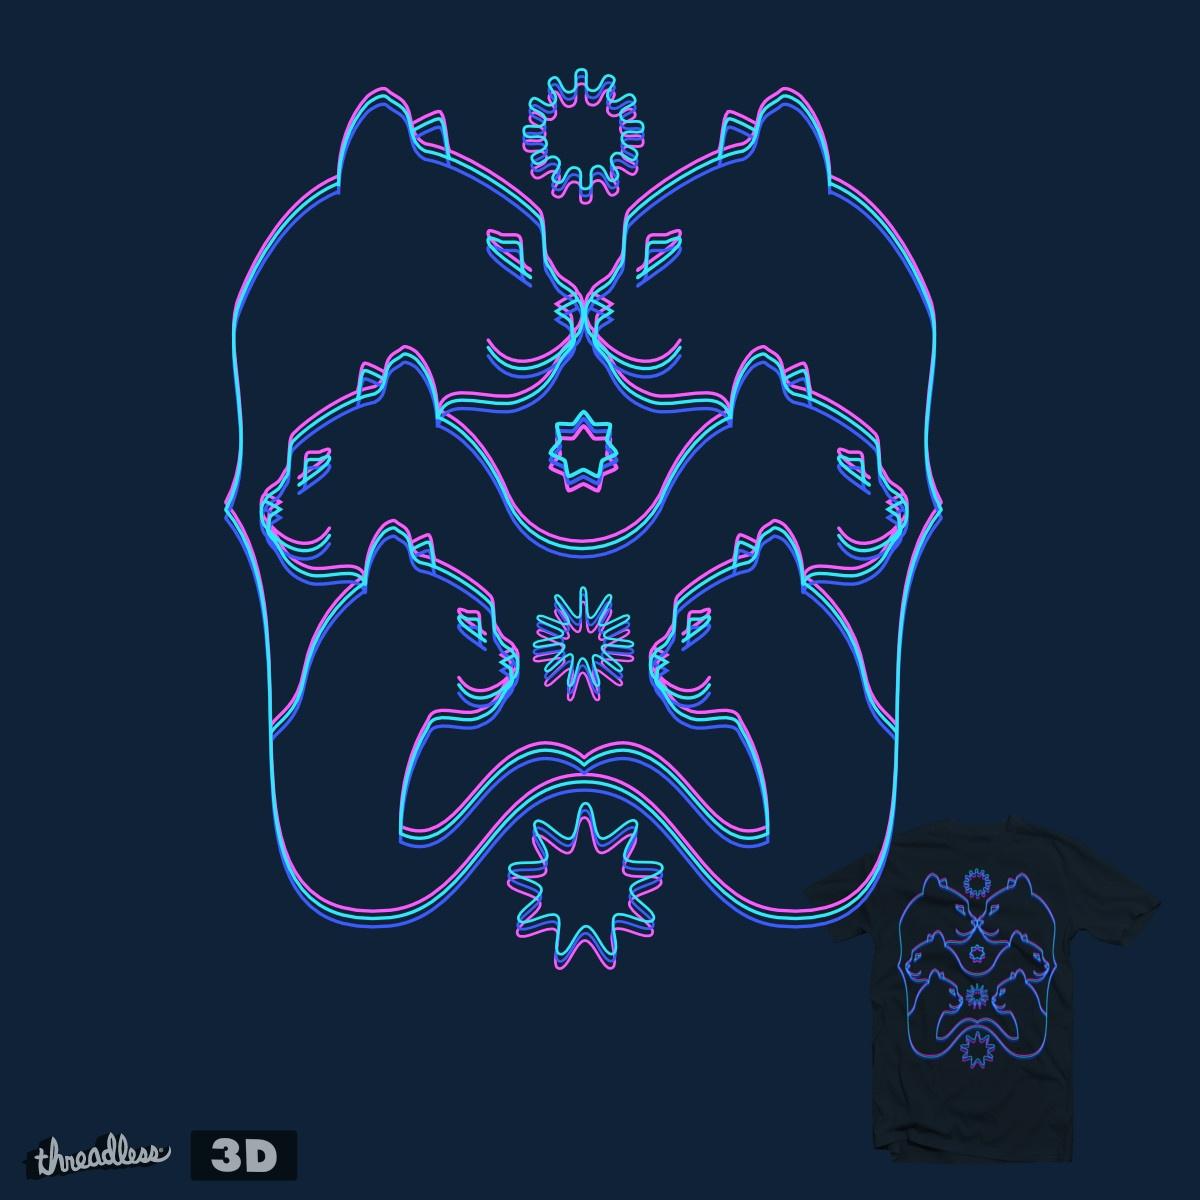 Shhamanic vision by hilektron on Threadless